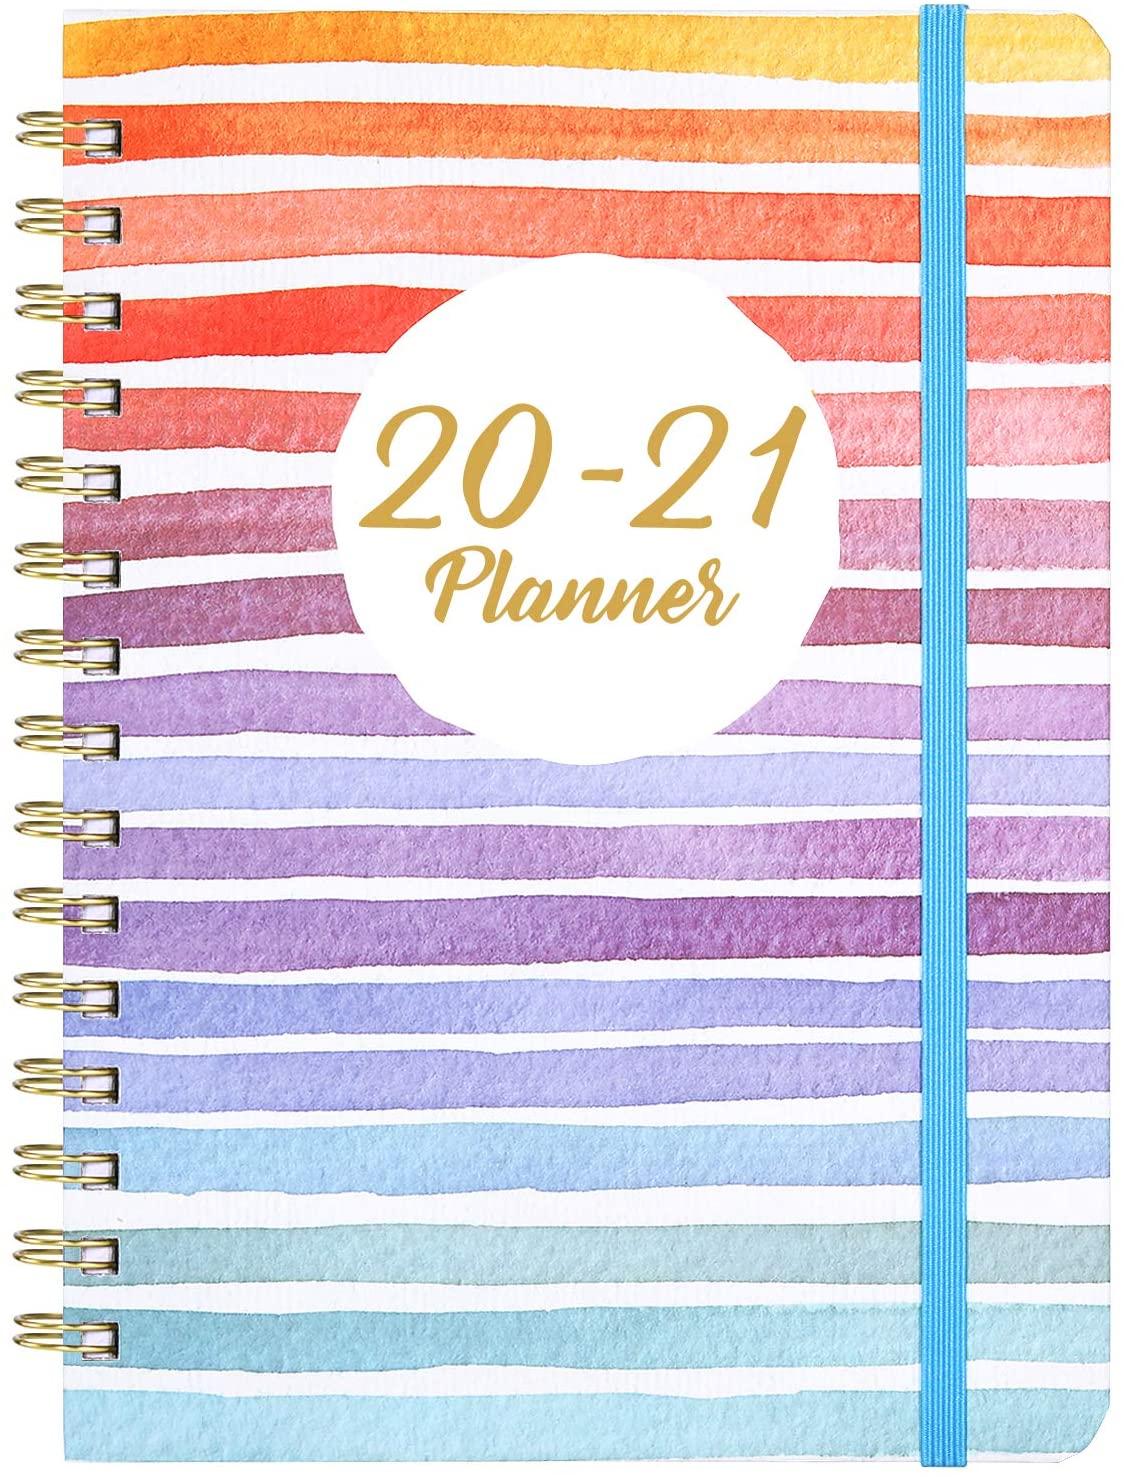 20-21 Planner